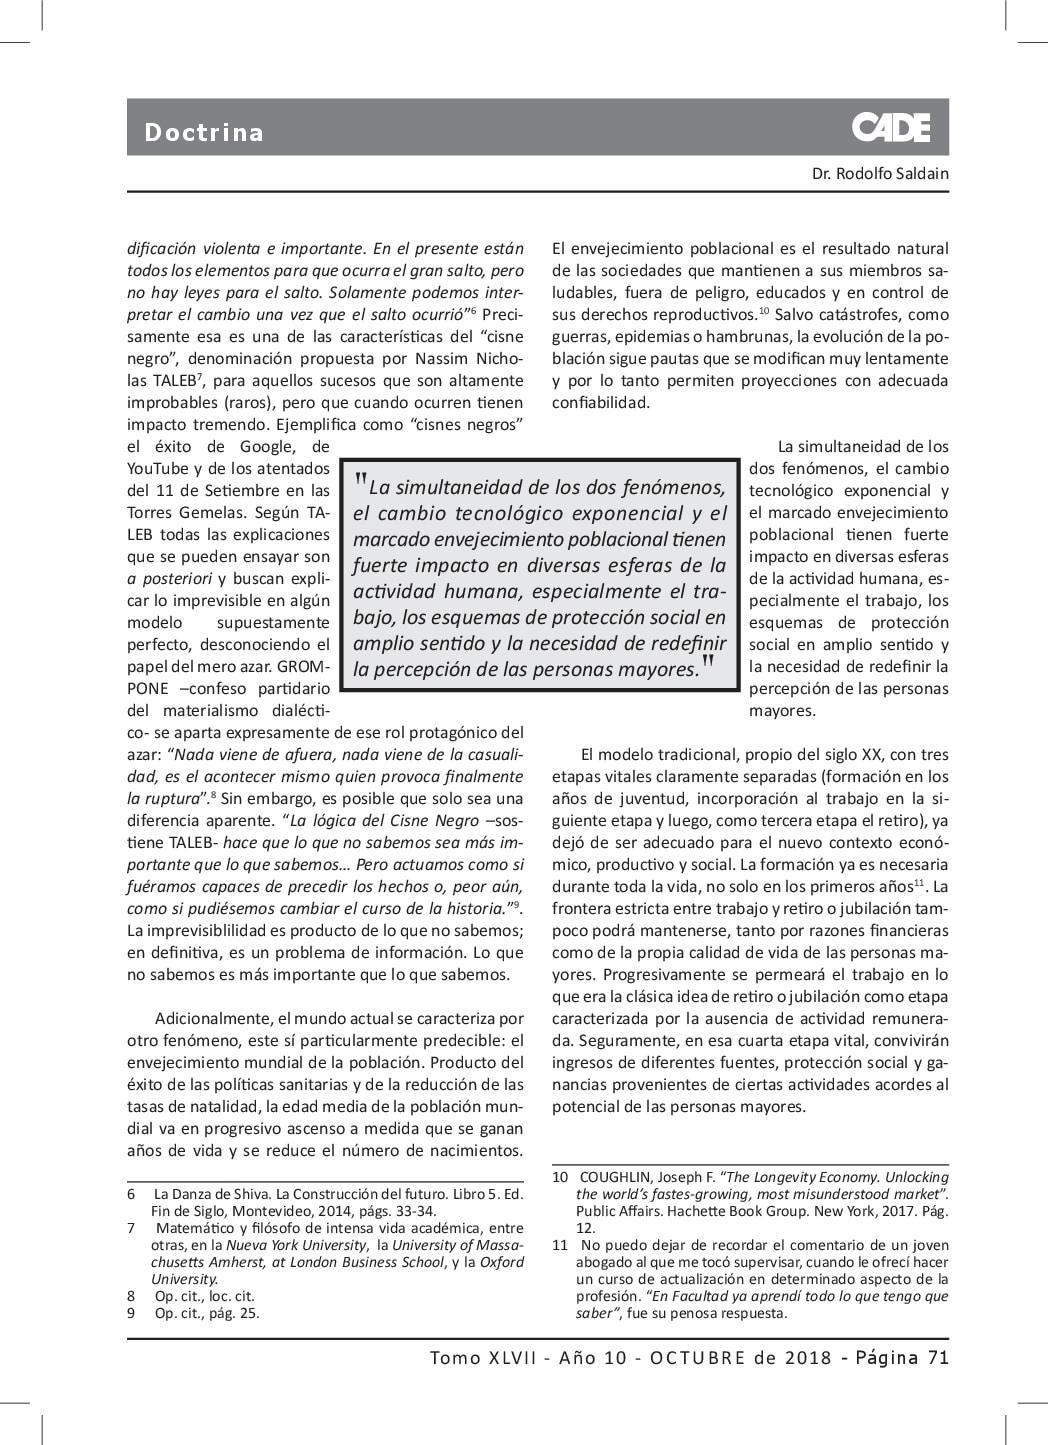 cade-doctrina-jurisprudencia-saldain-003